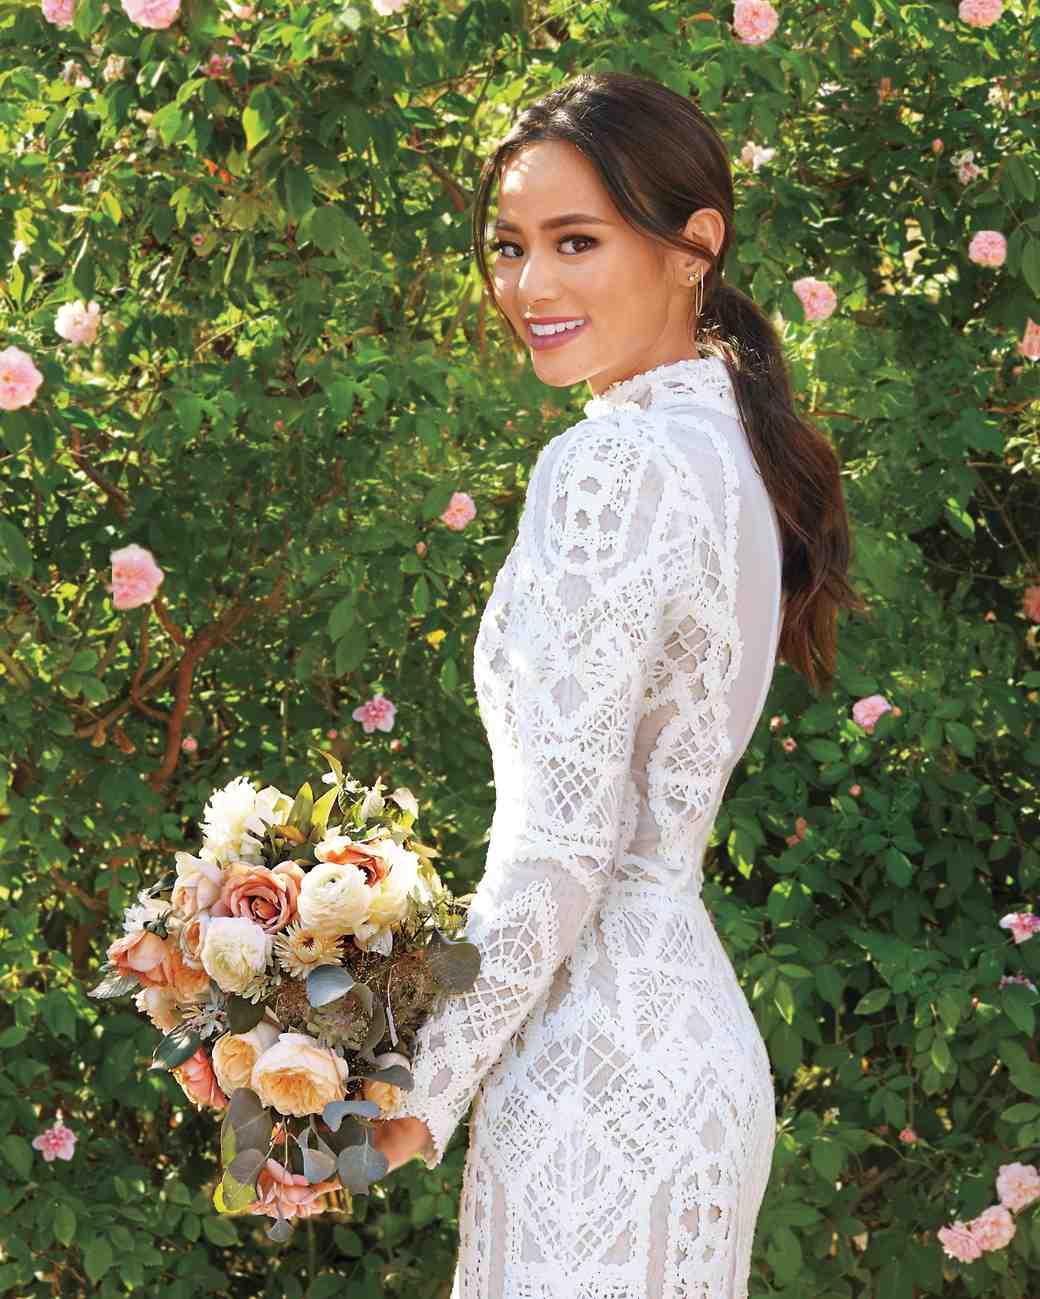 Superior Jamie Chung Bridal Beauty Look